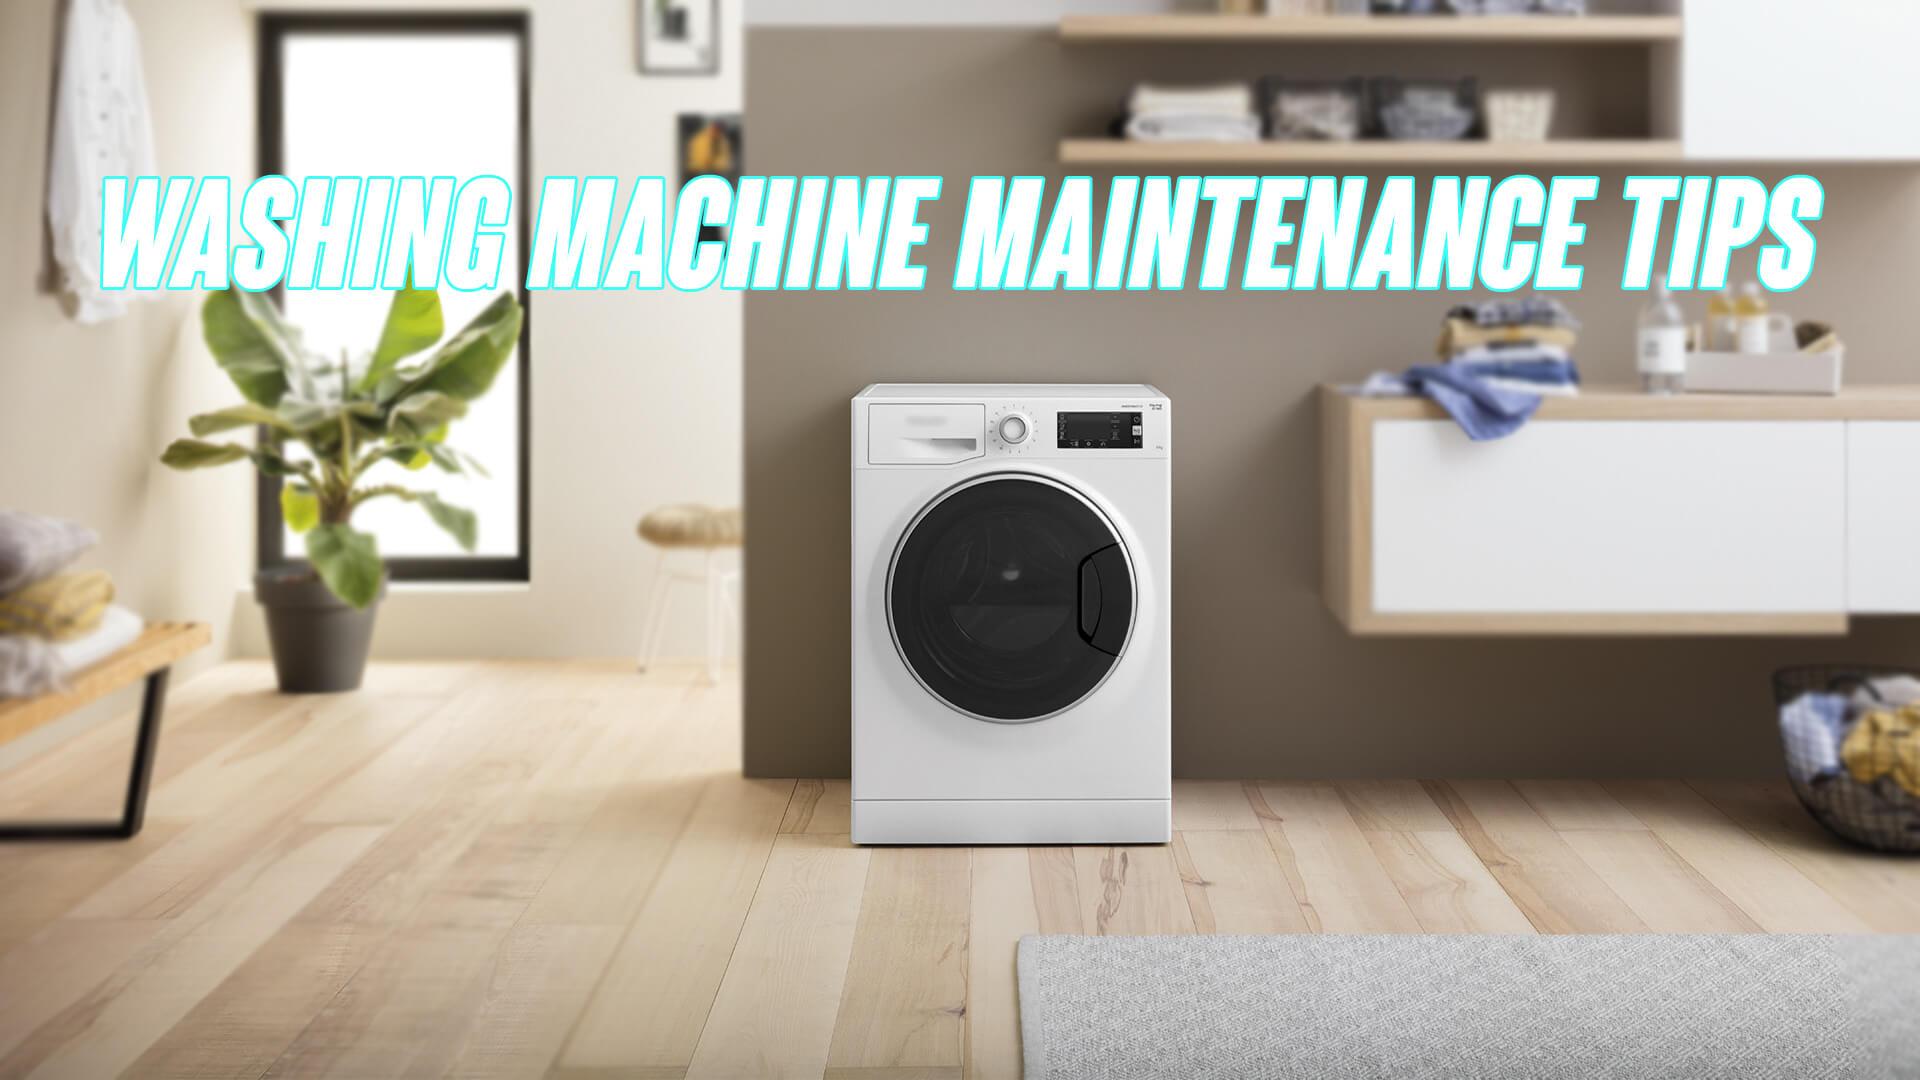 Essential Washing Machine Maintenance Tips: How to Extend Washing Machine's Life